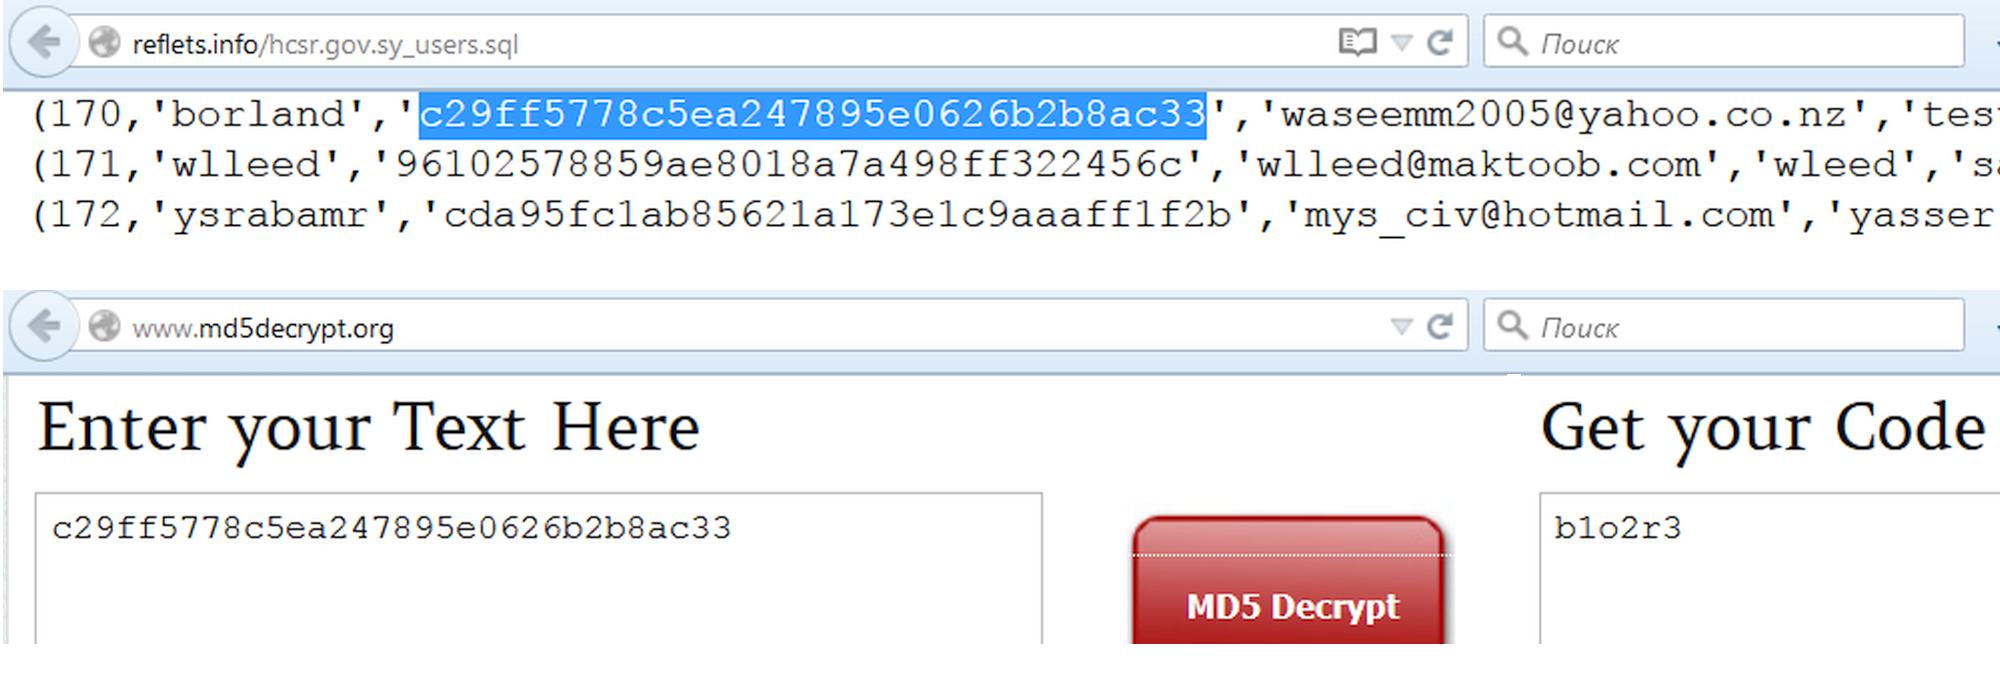 Подбор пароля по хешу MD5